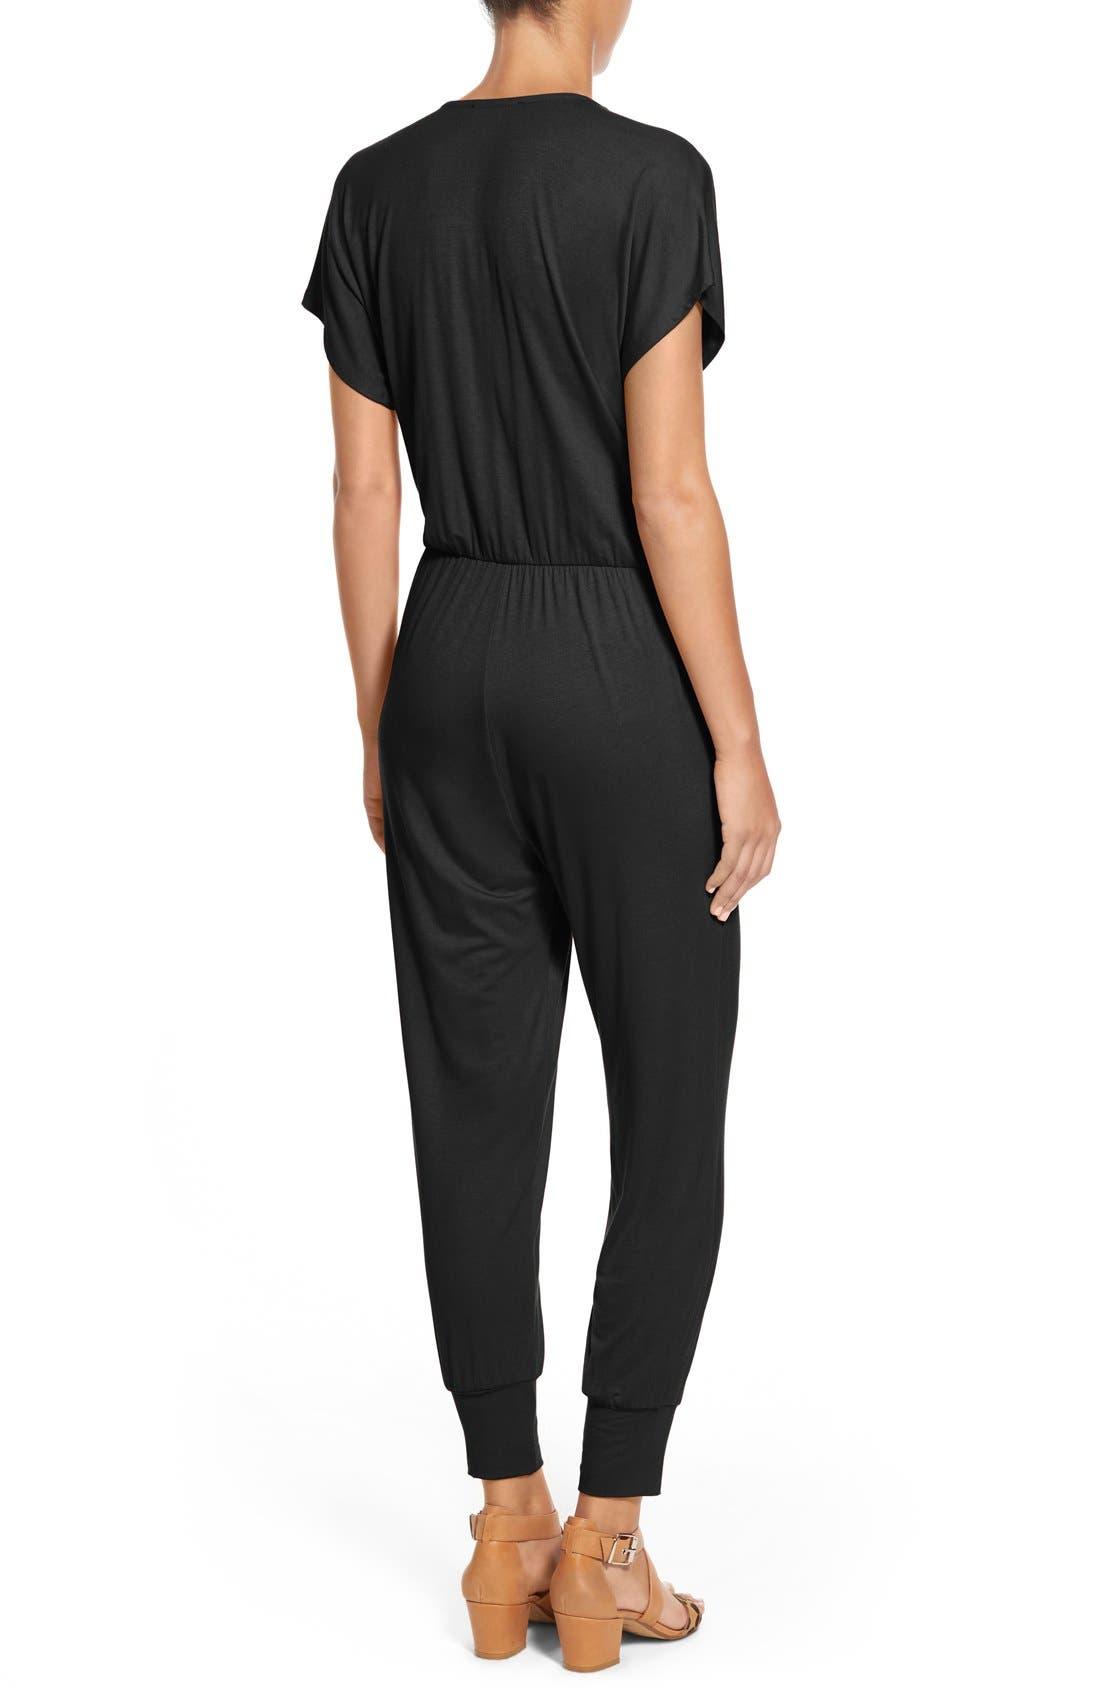 LOVEAPPELLA, Short Sleeve Wrap Top Jumpsuit, Alternate thumbnail 4, color, BLACK